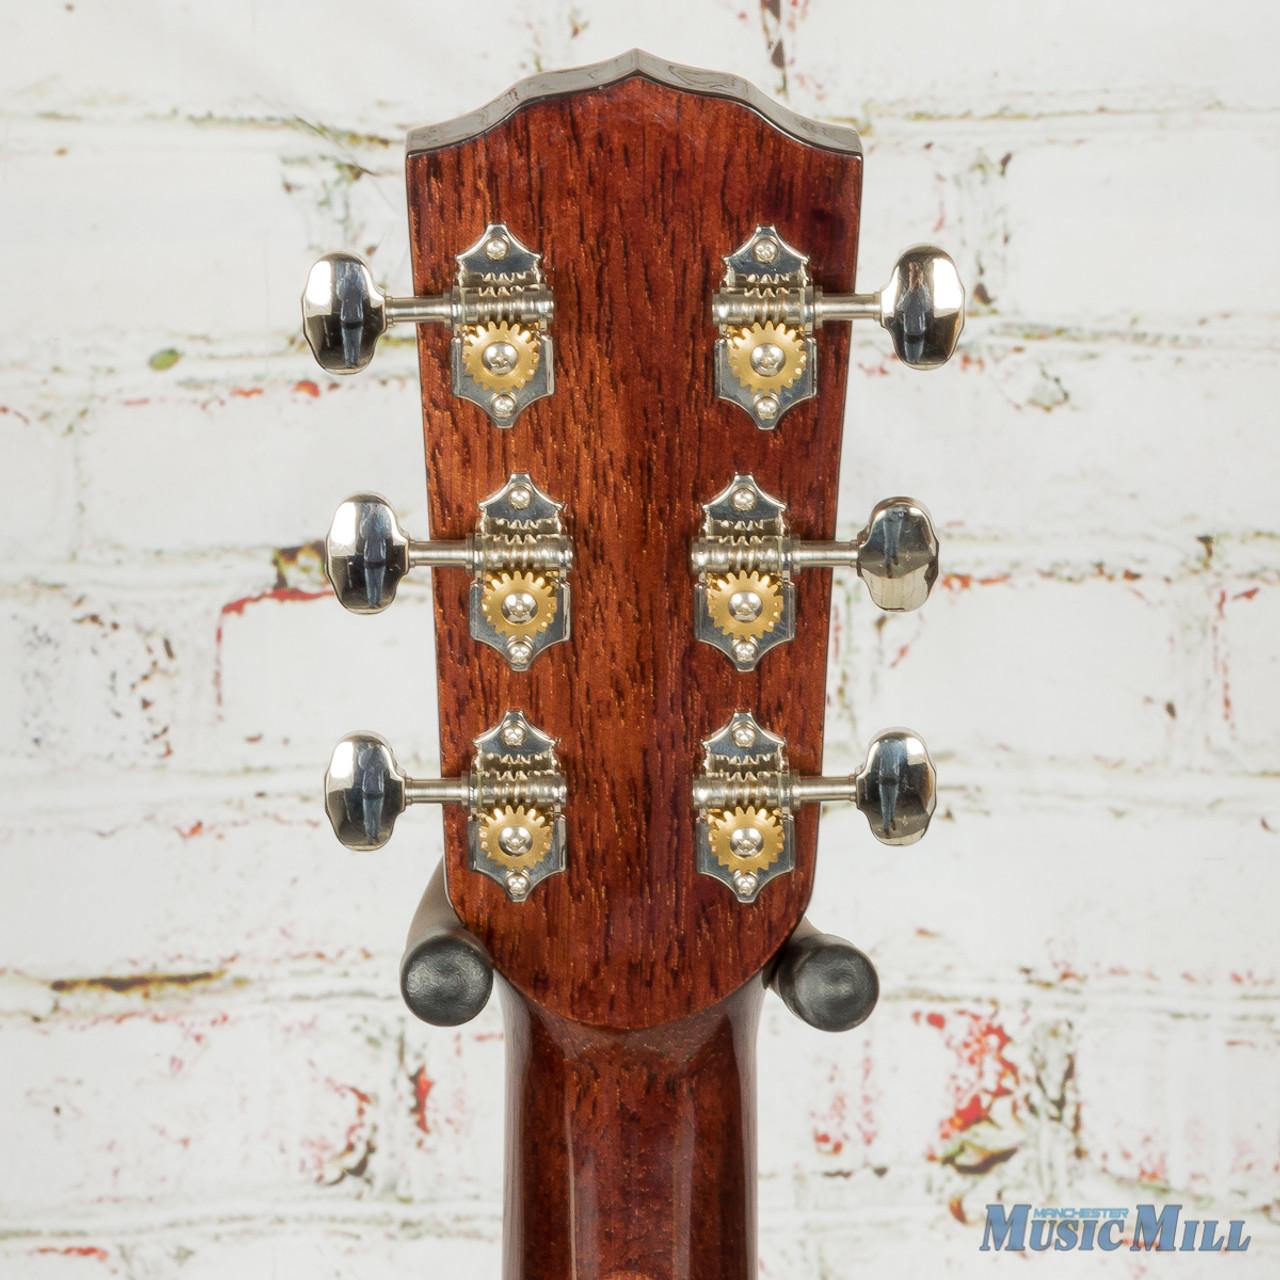 d6173249ff3 Fender CP-140SE Acoustic Electric Guitar Sunburst x0388 (USED)